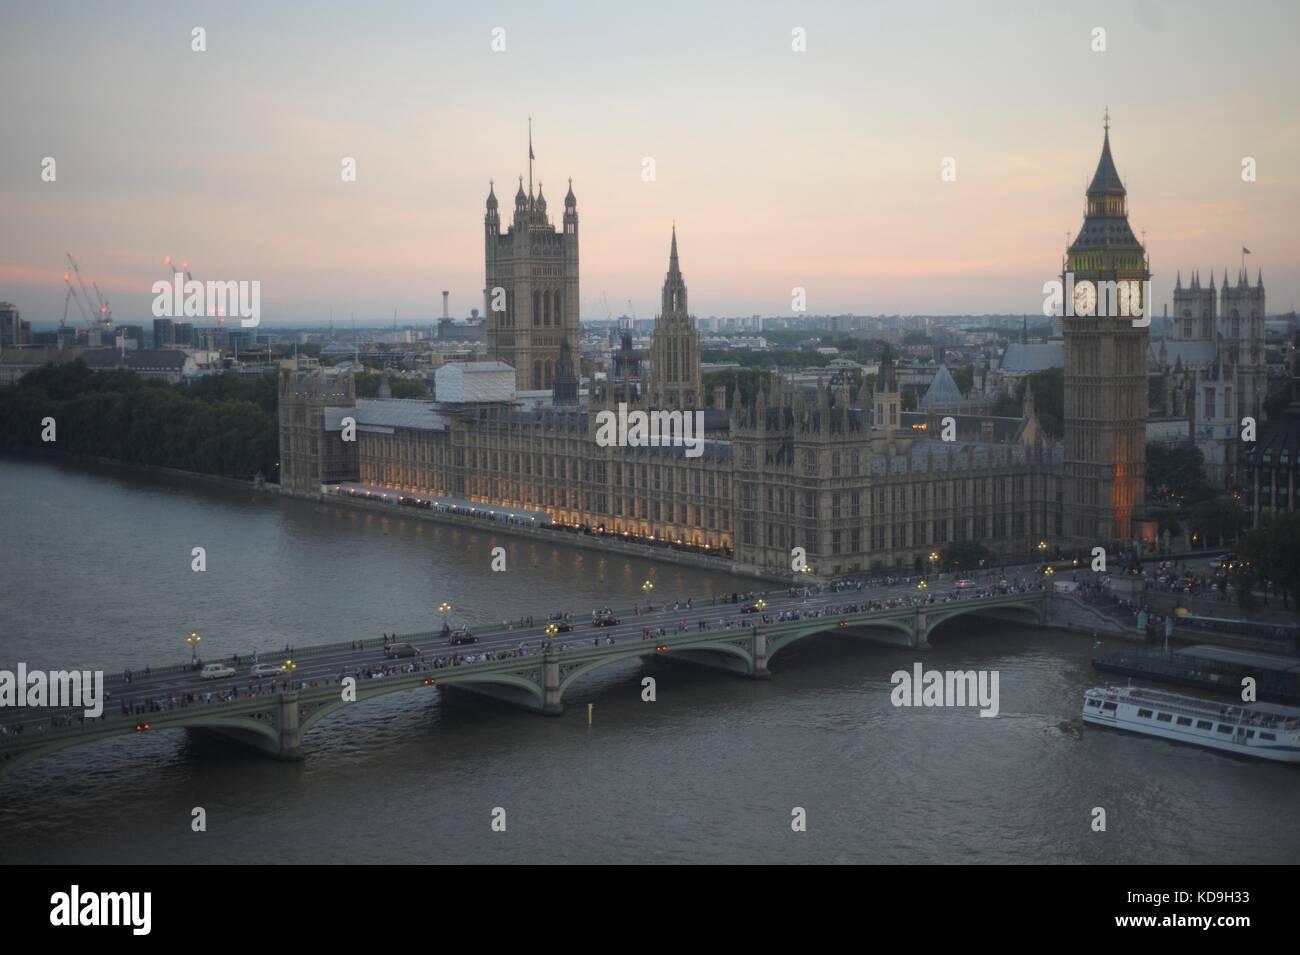 Vedute aeree di Londra Immagini Stock